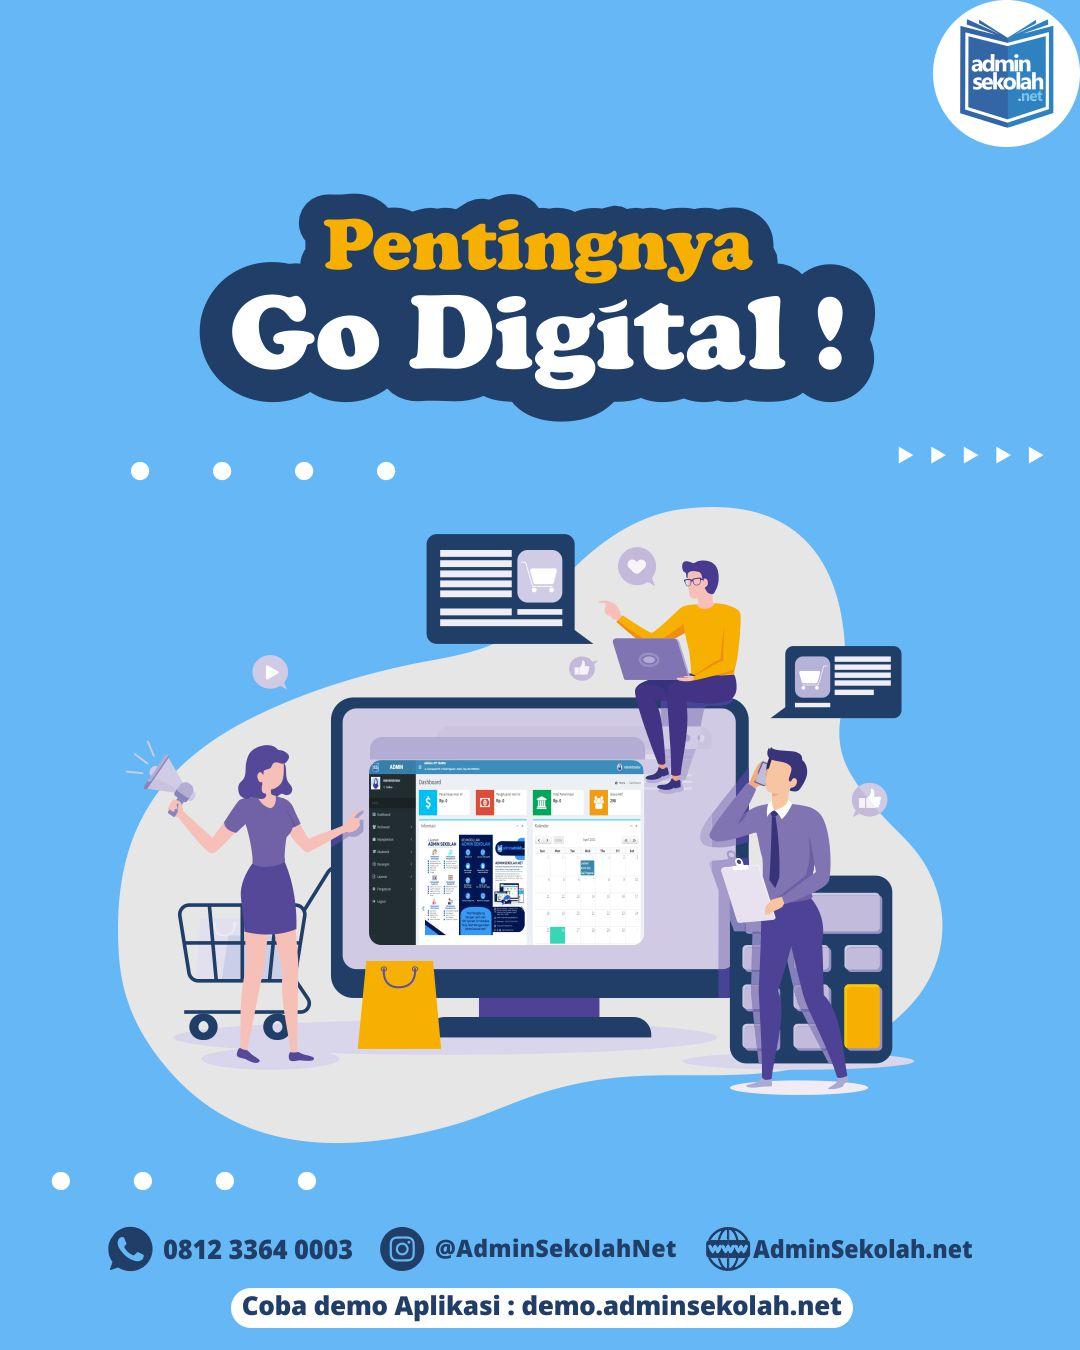 Pentingnya Go Digital !